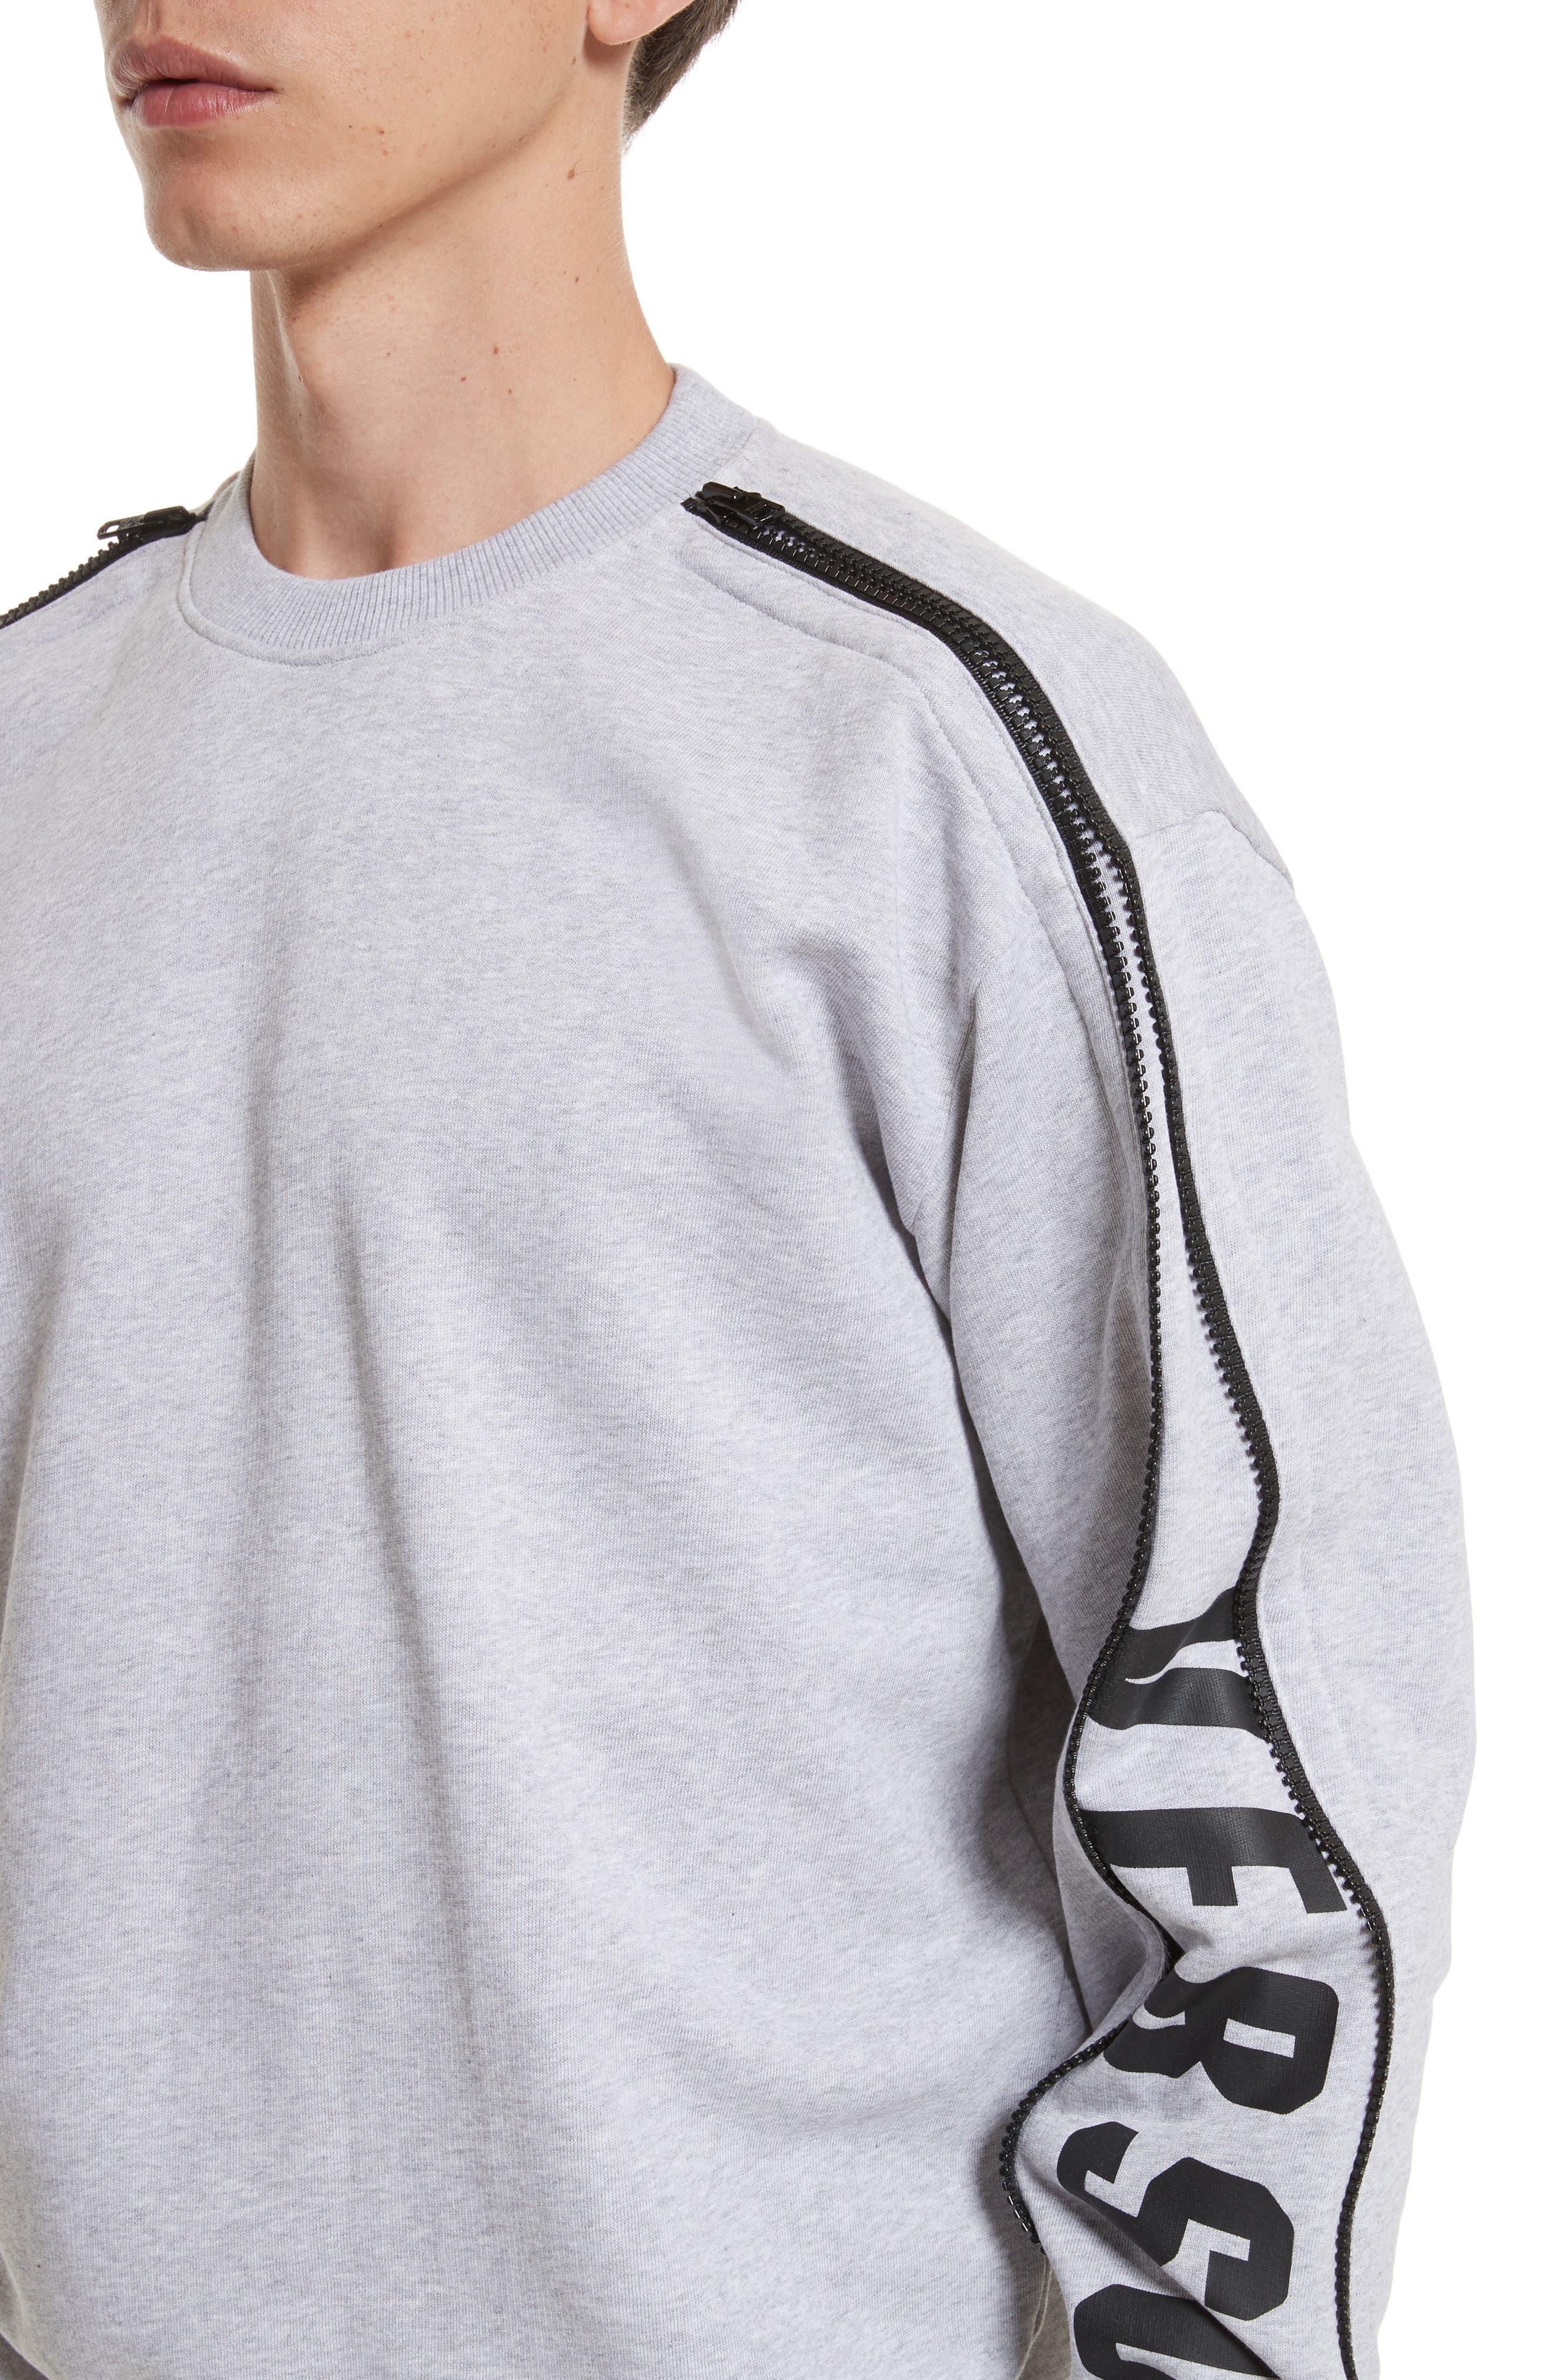 VERSUS by Versace Zip Sleeve Crewneck Sweatshirt,                             Alternate thumbnail 4, color,                             Grey